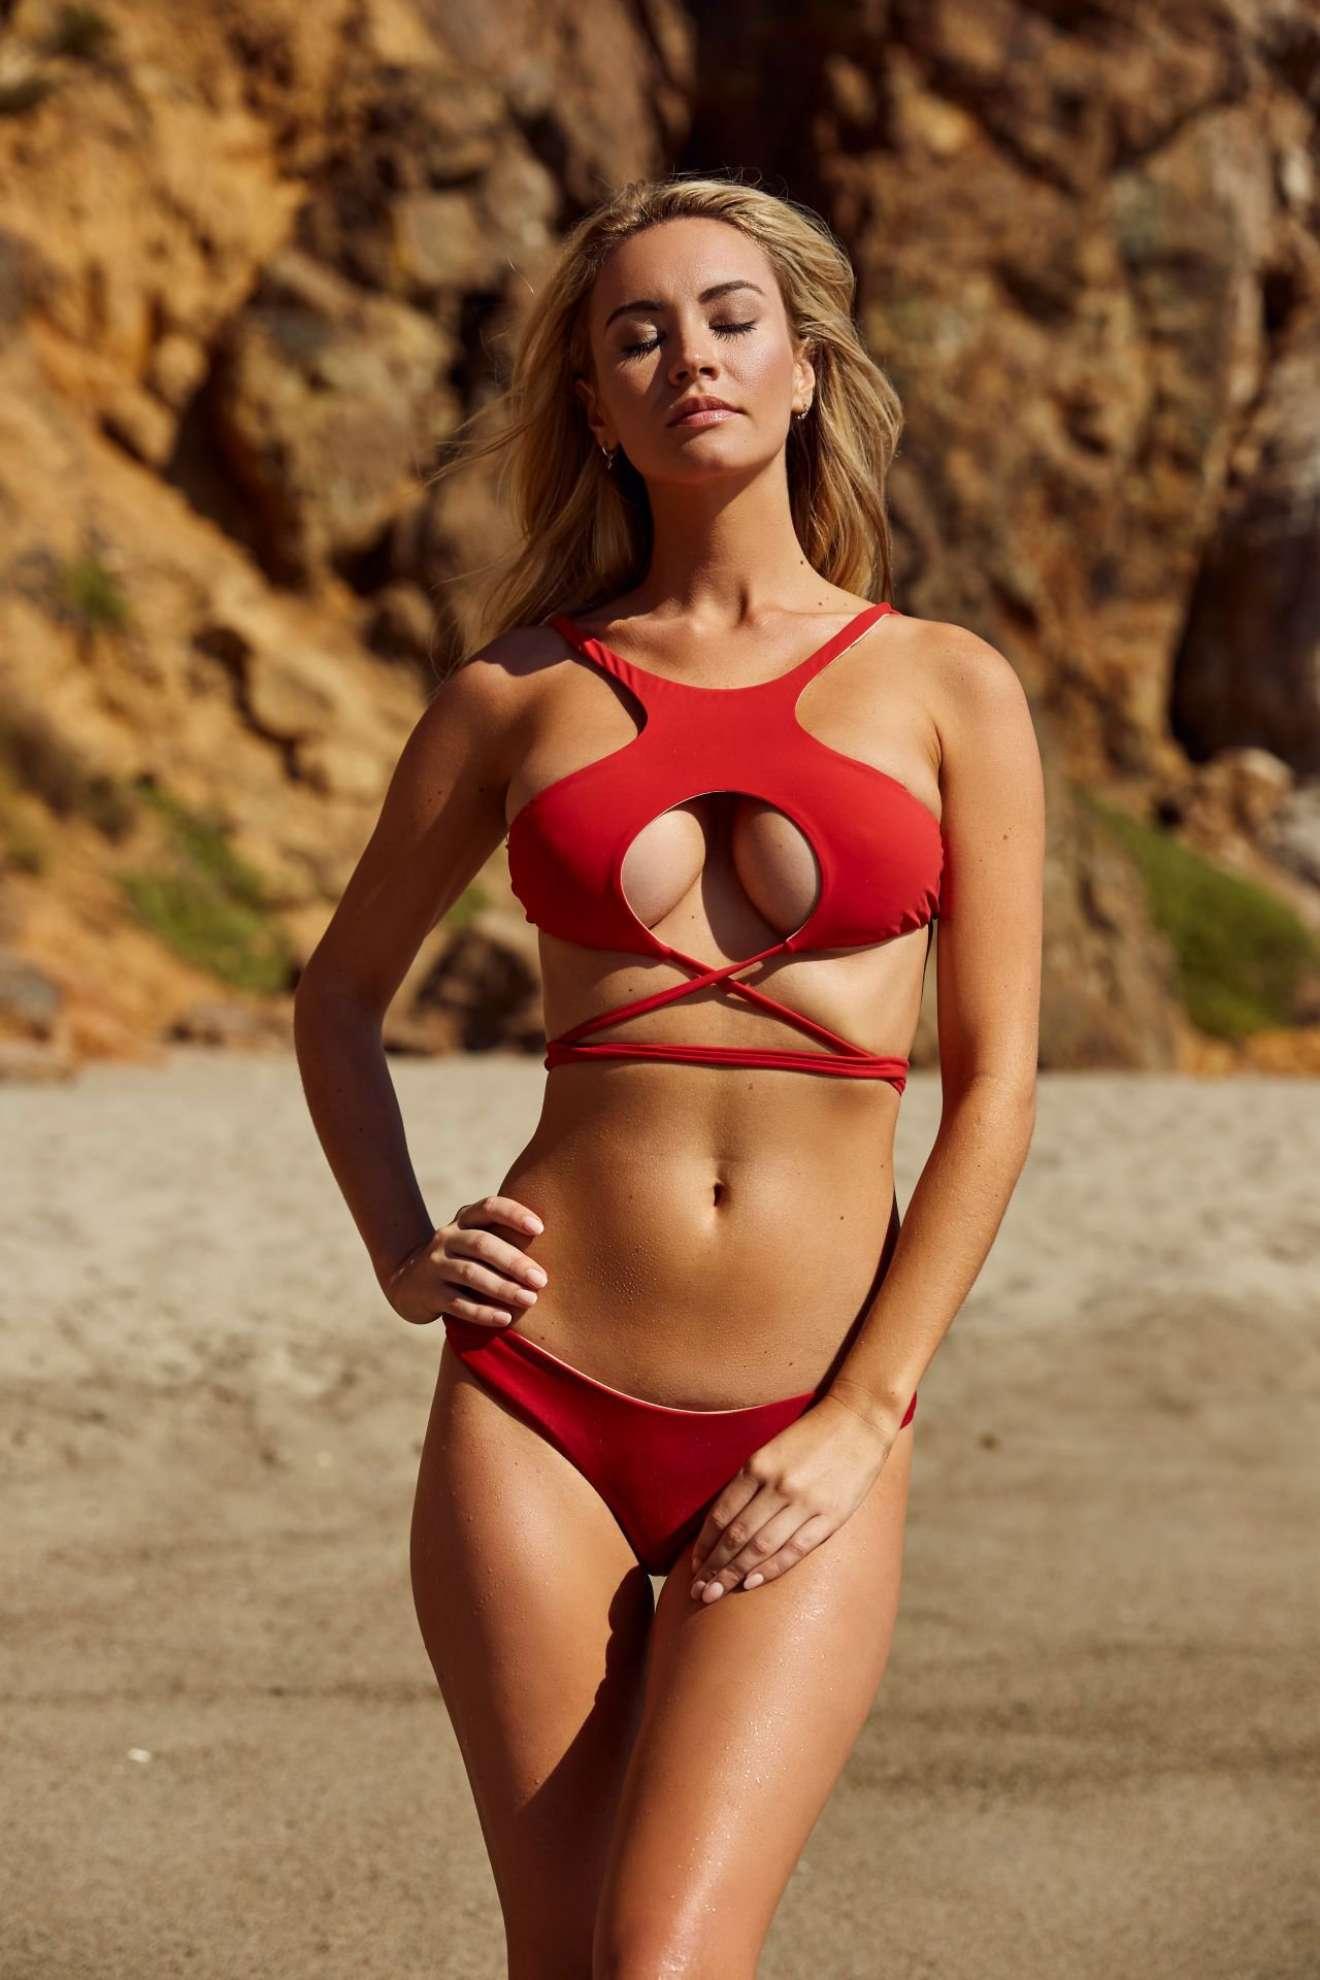 Bryana Holly – Bikini Photoshoot